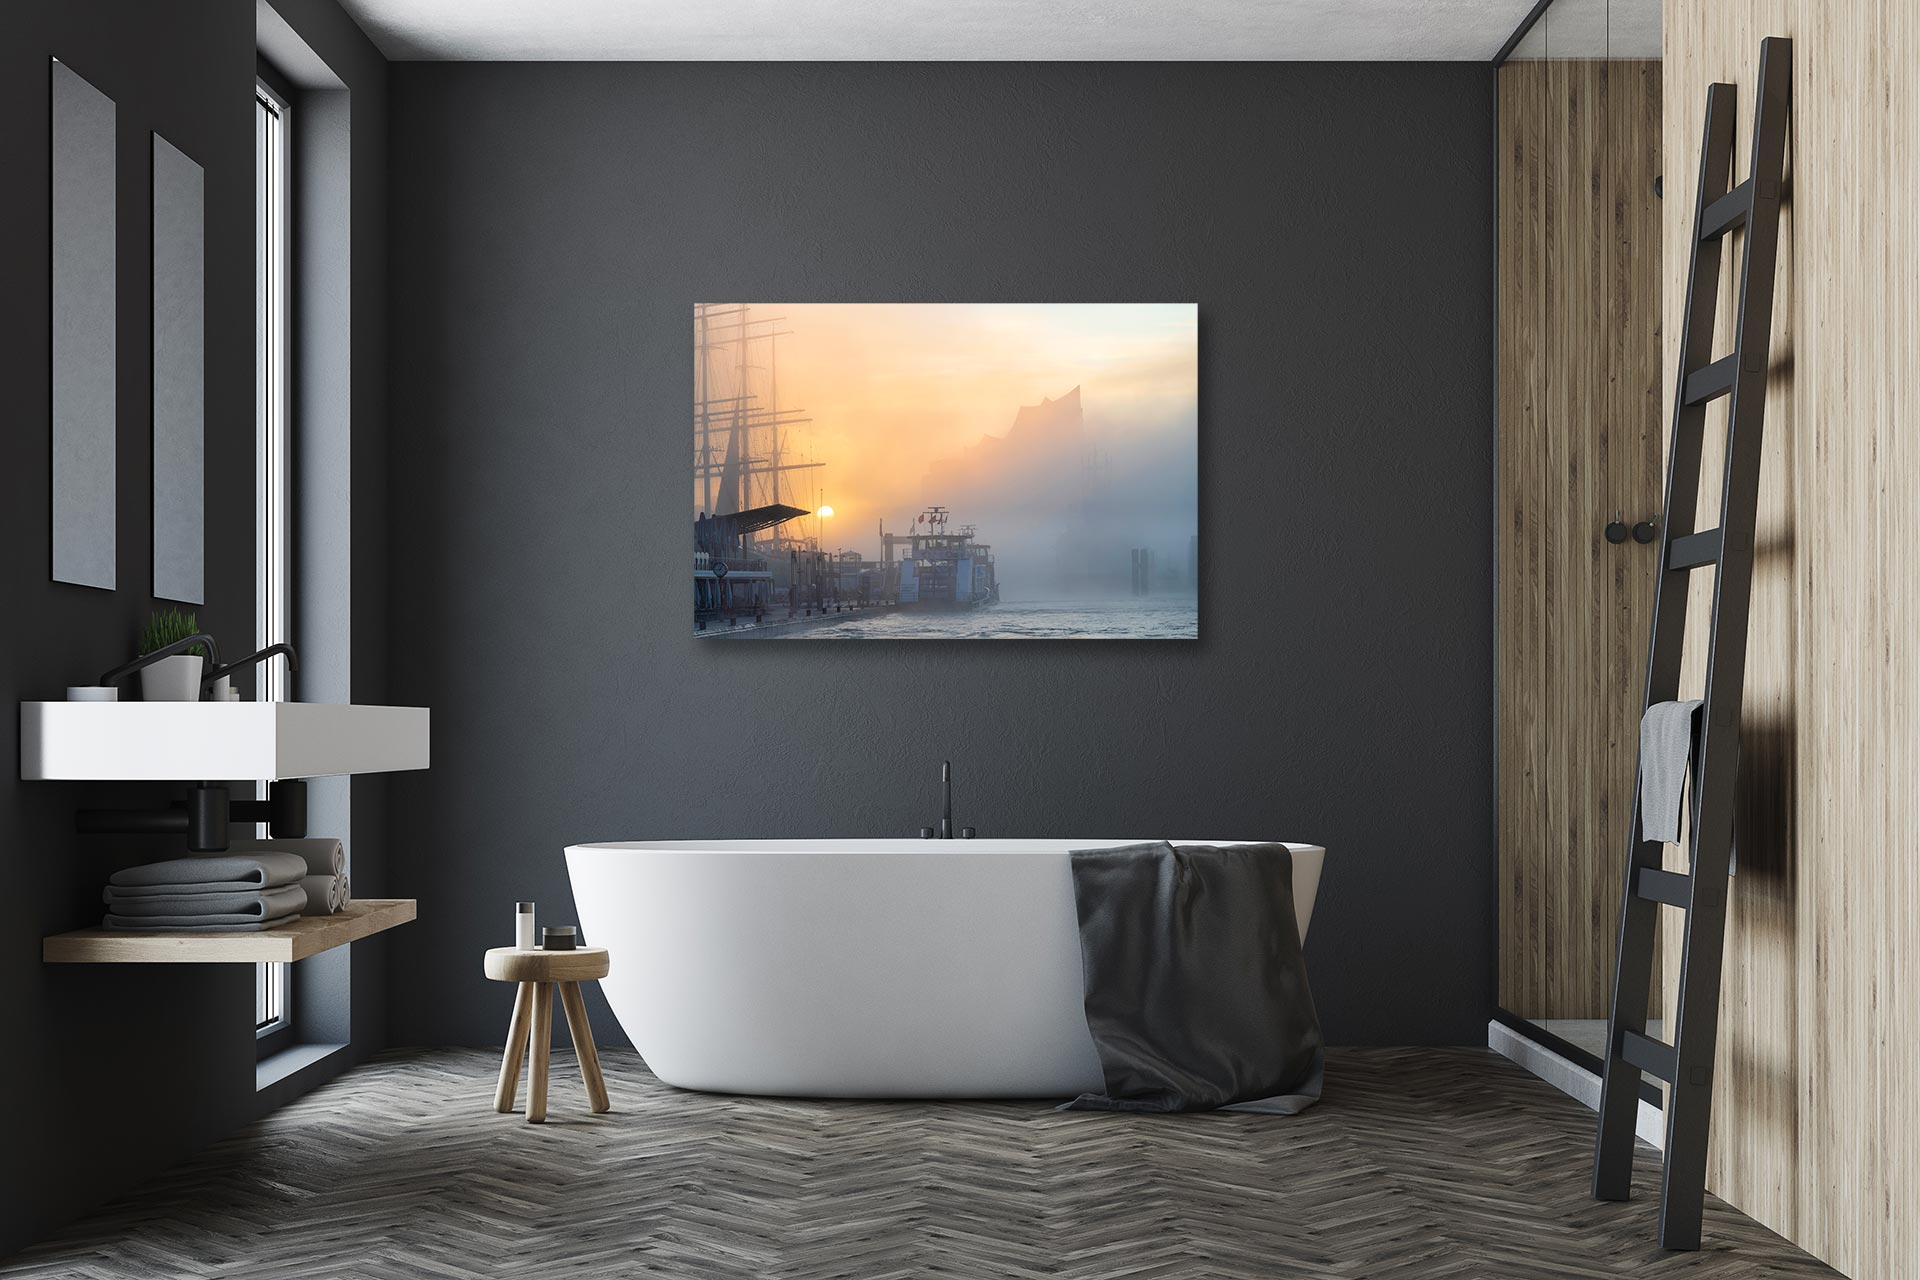 LCW299-sonnennebel-bild-auf-leinwand-acrylglas-aludibond-badezimmer